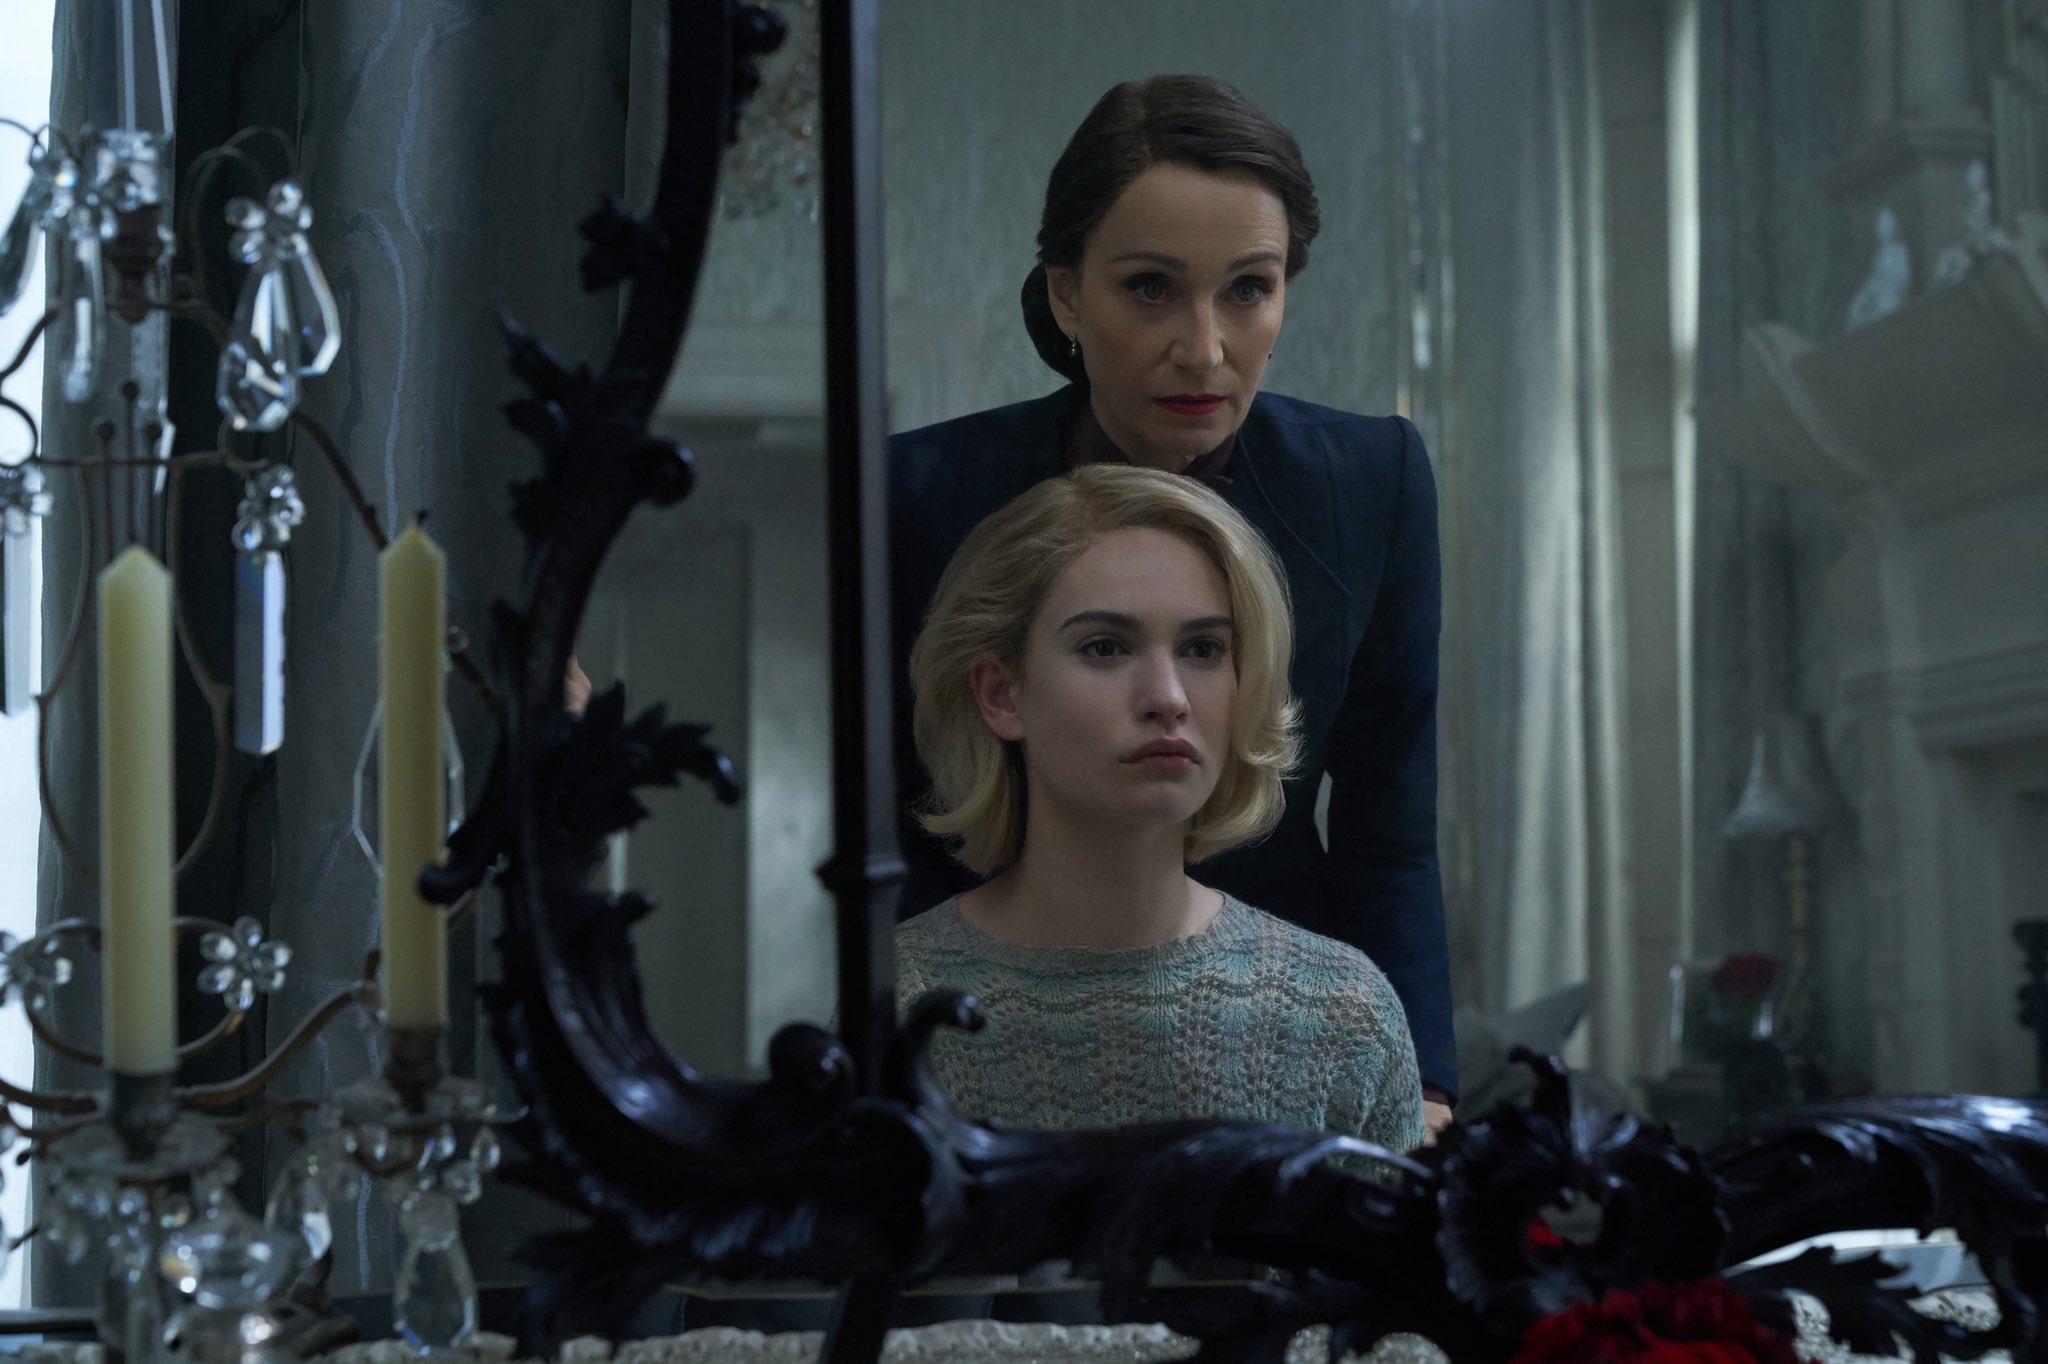 Rebecca film netflix 2020 (2)